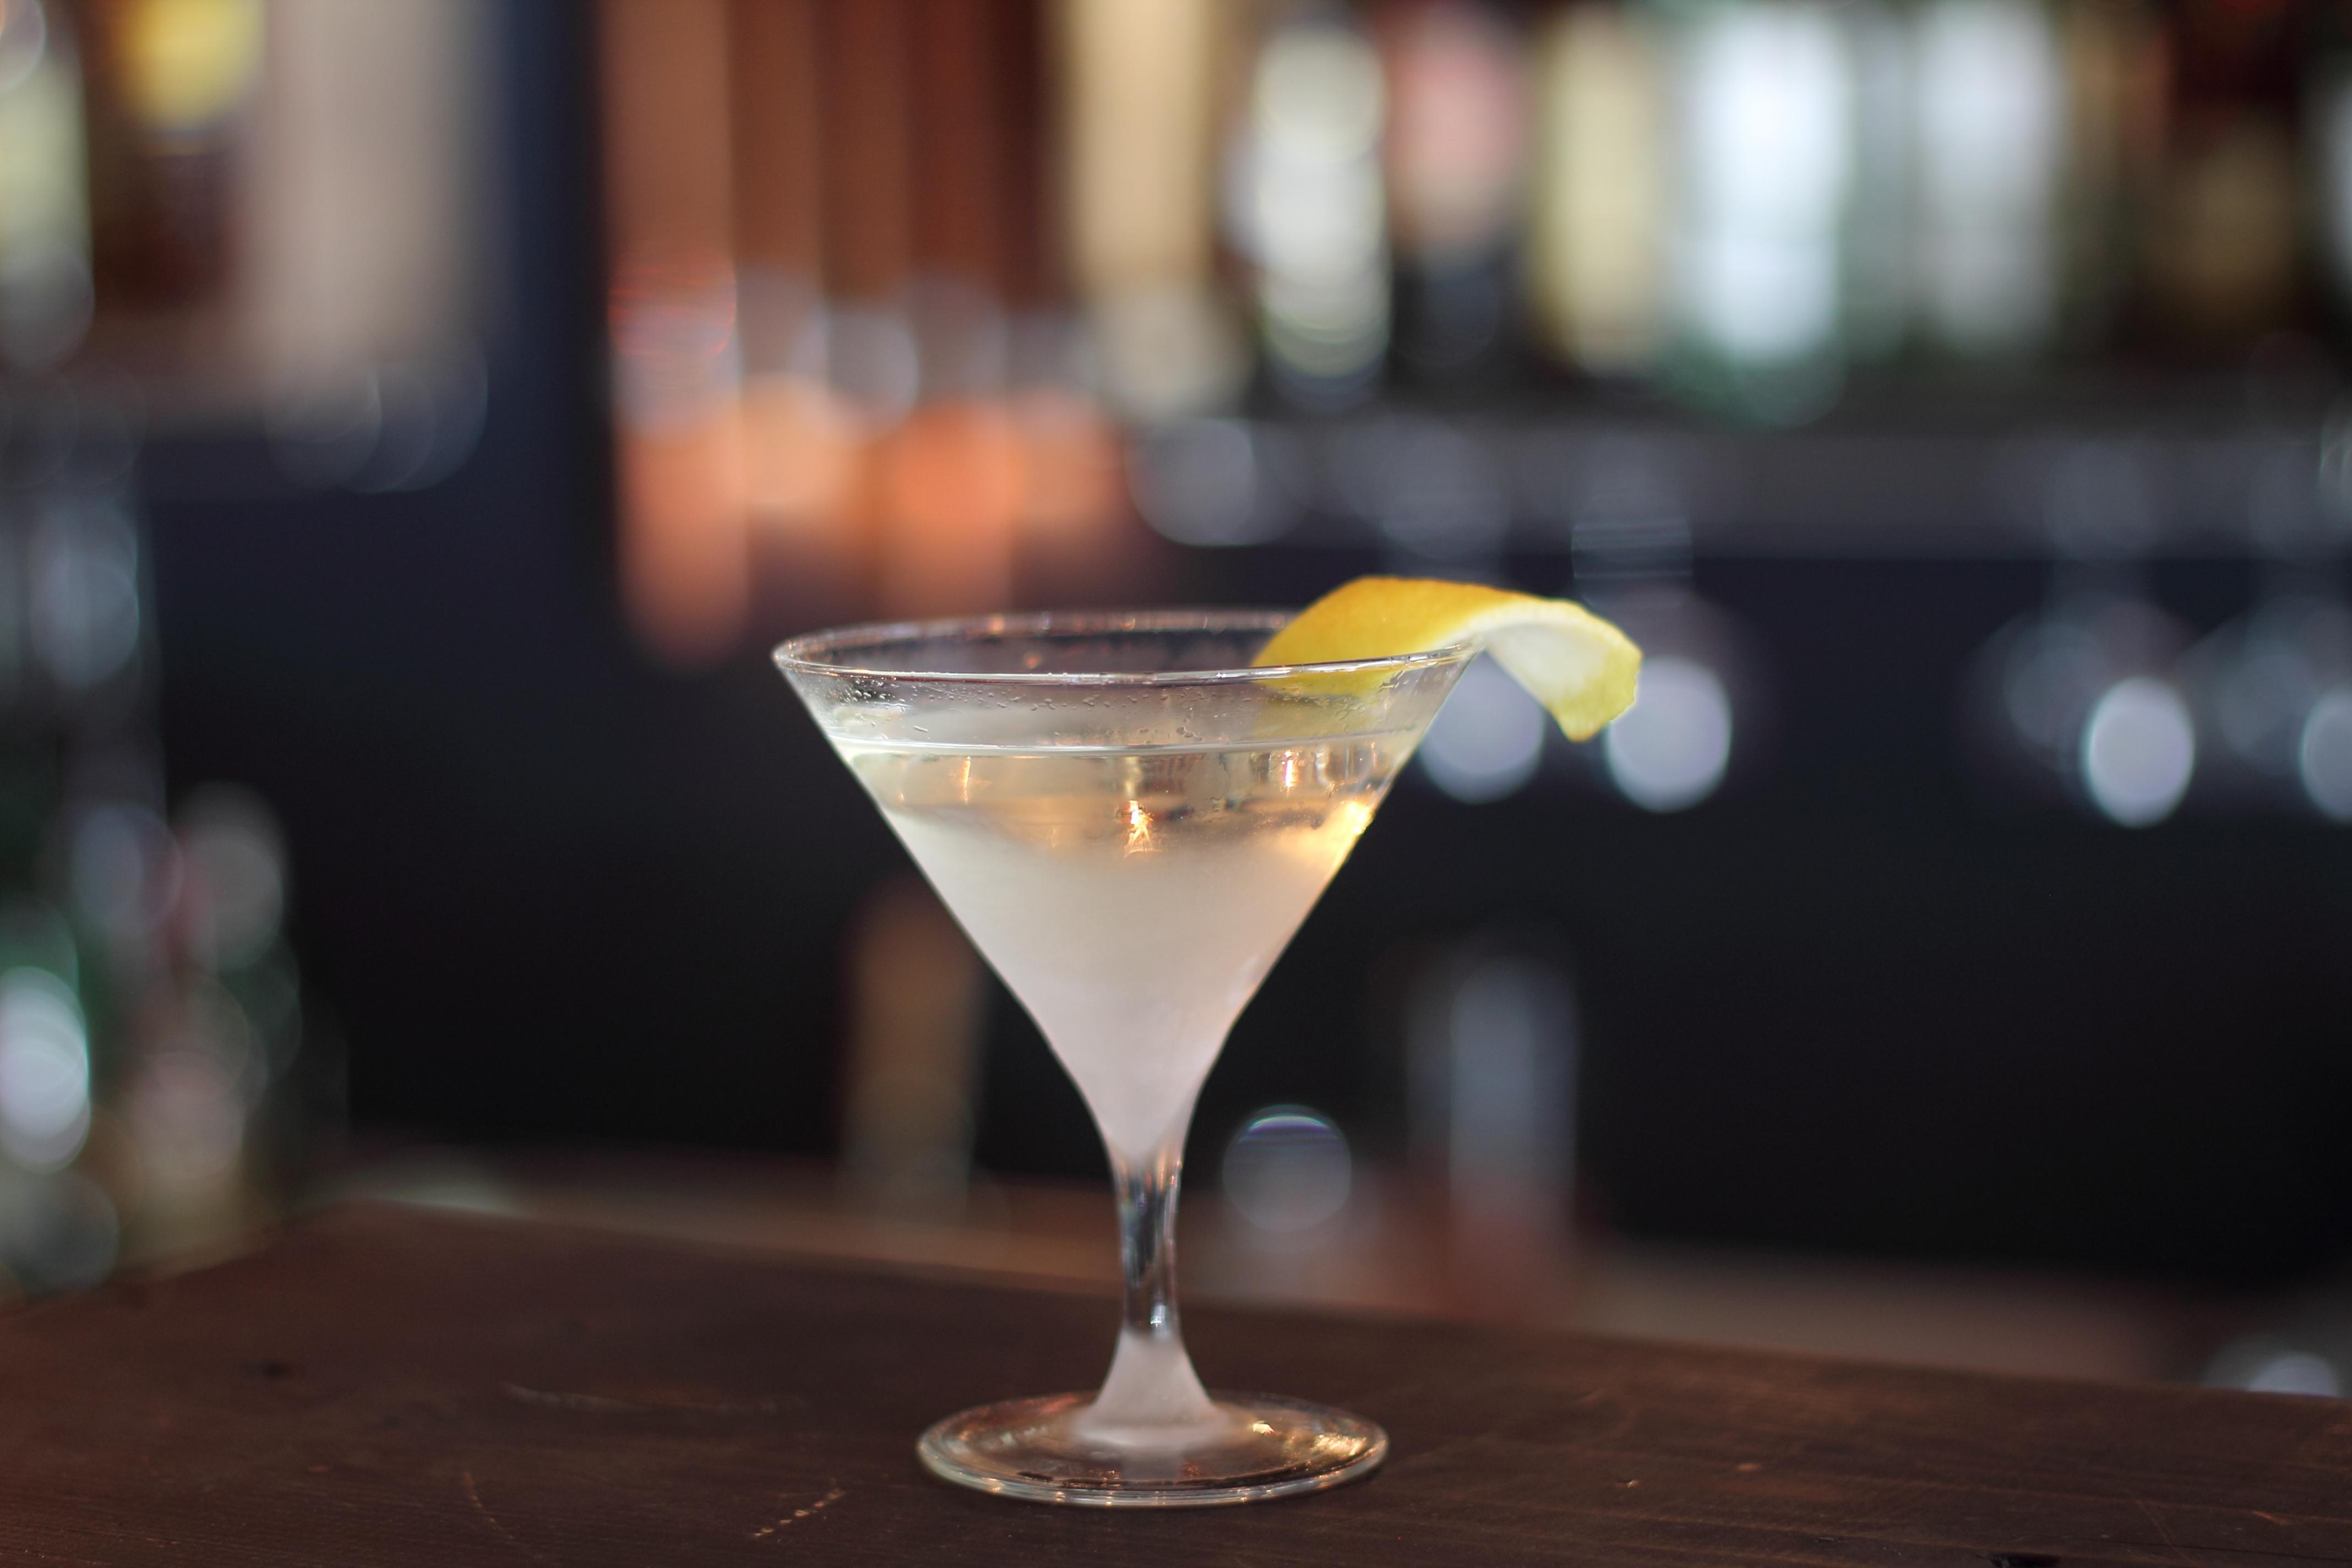 Bianco richtig servieren martini Martini Royale